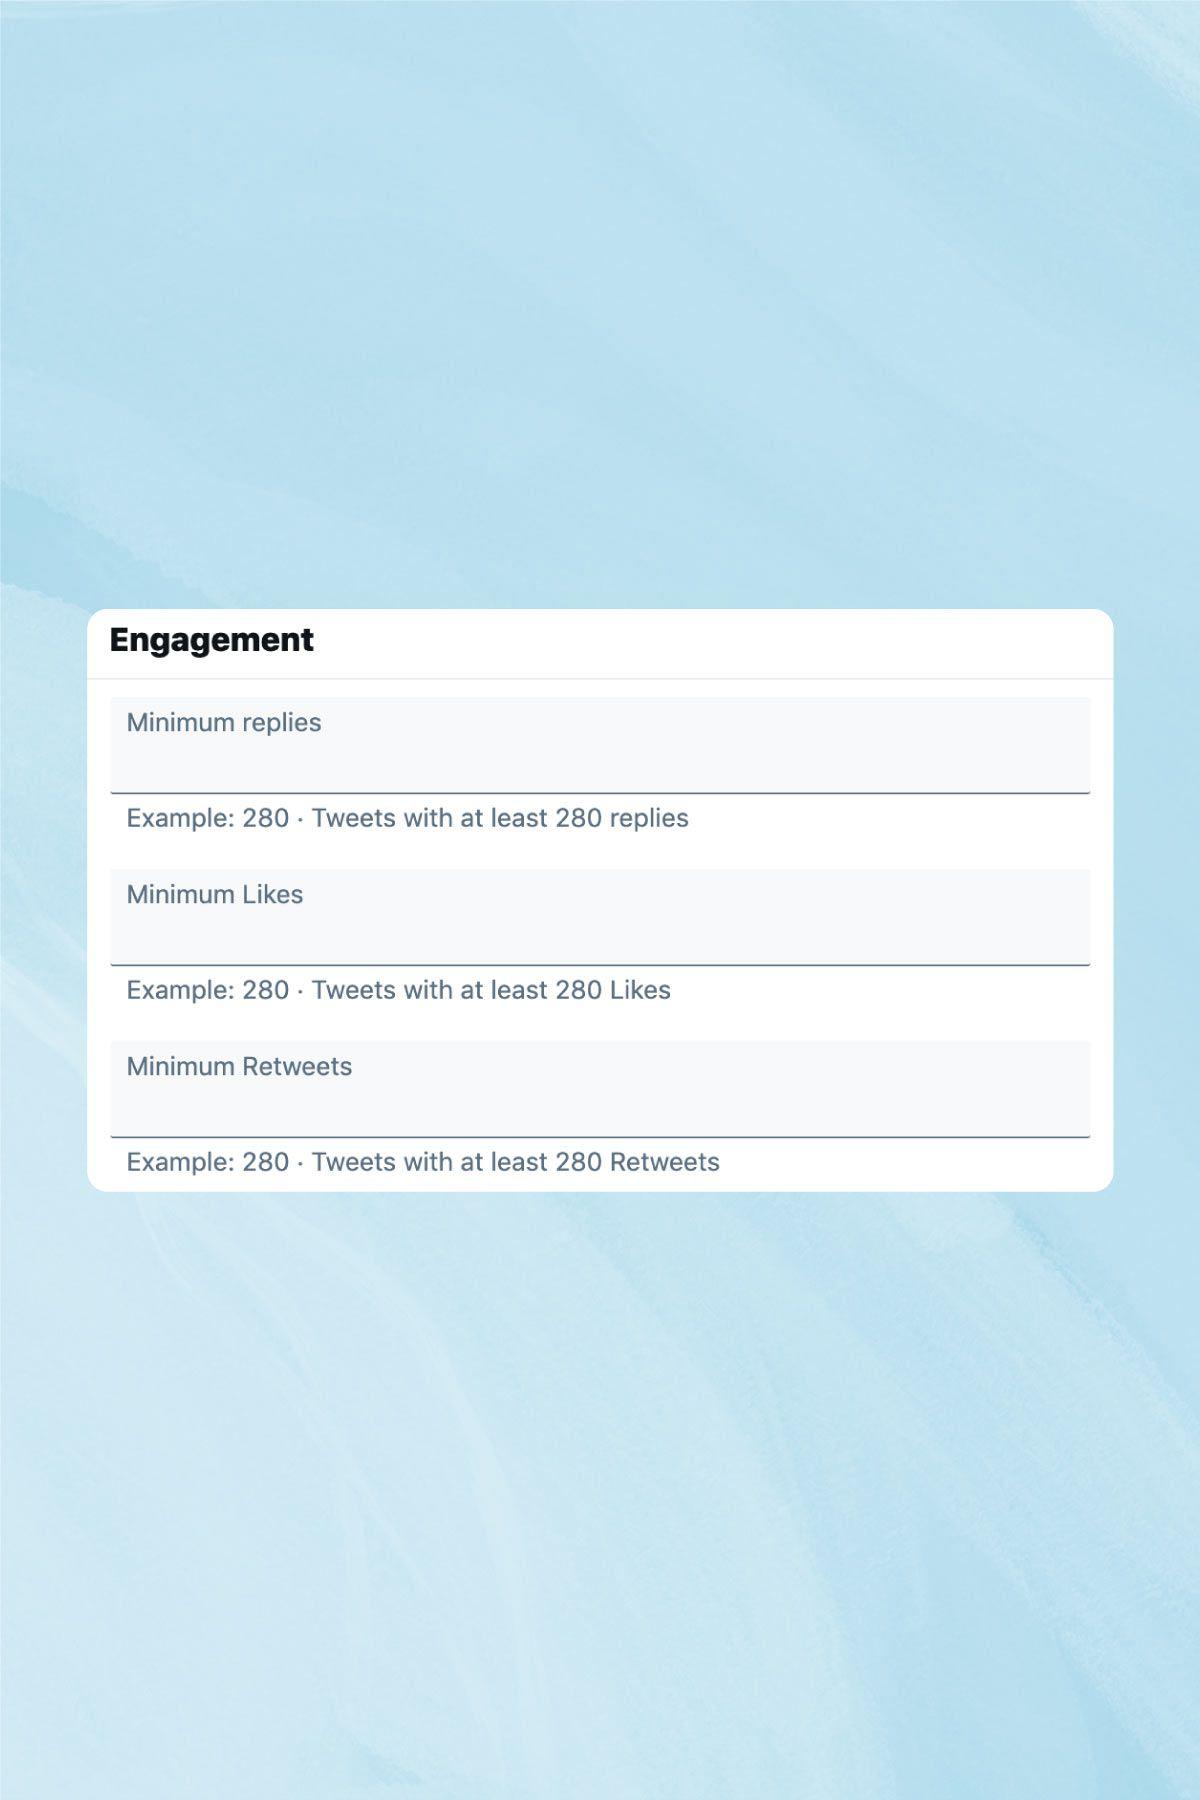 PLANOLY---Blog---Twitter-Advanced-Search---Blog-Assets---Engagement-Vertical